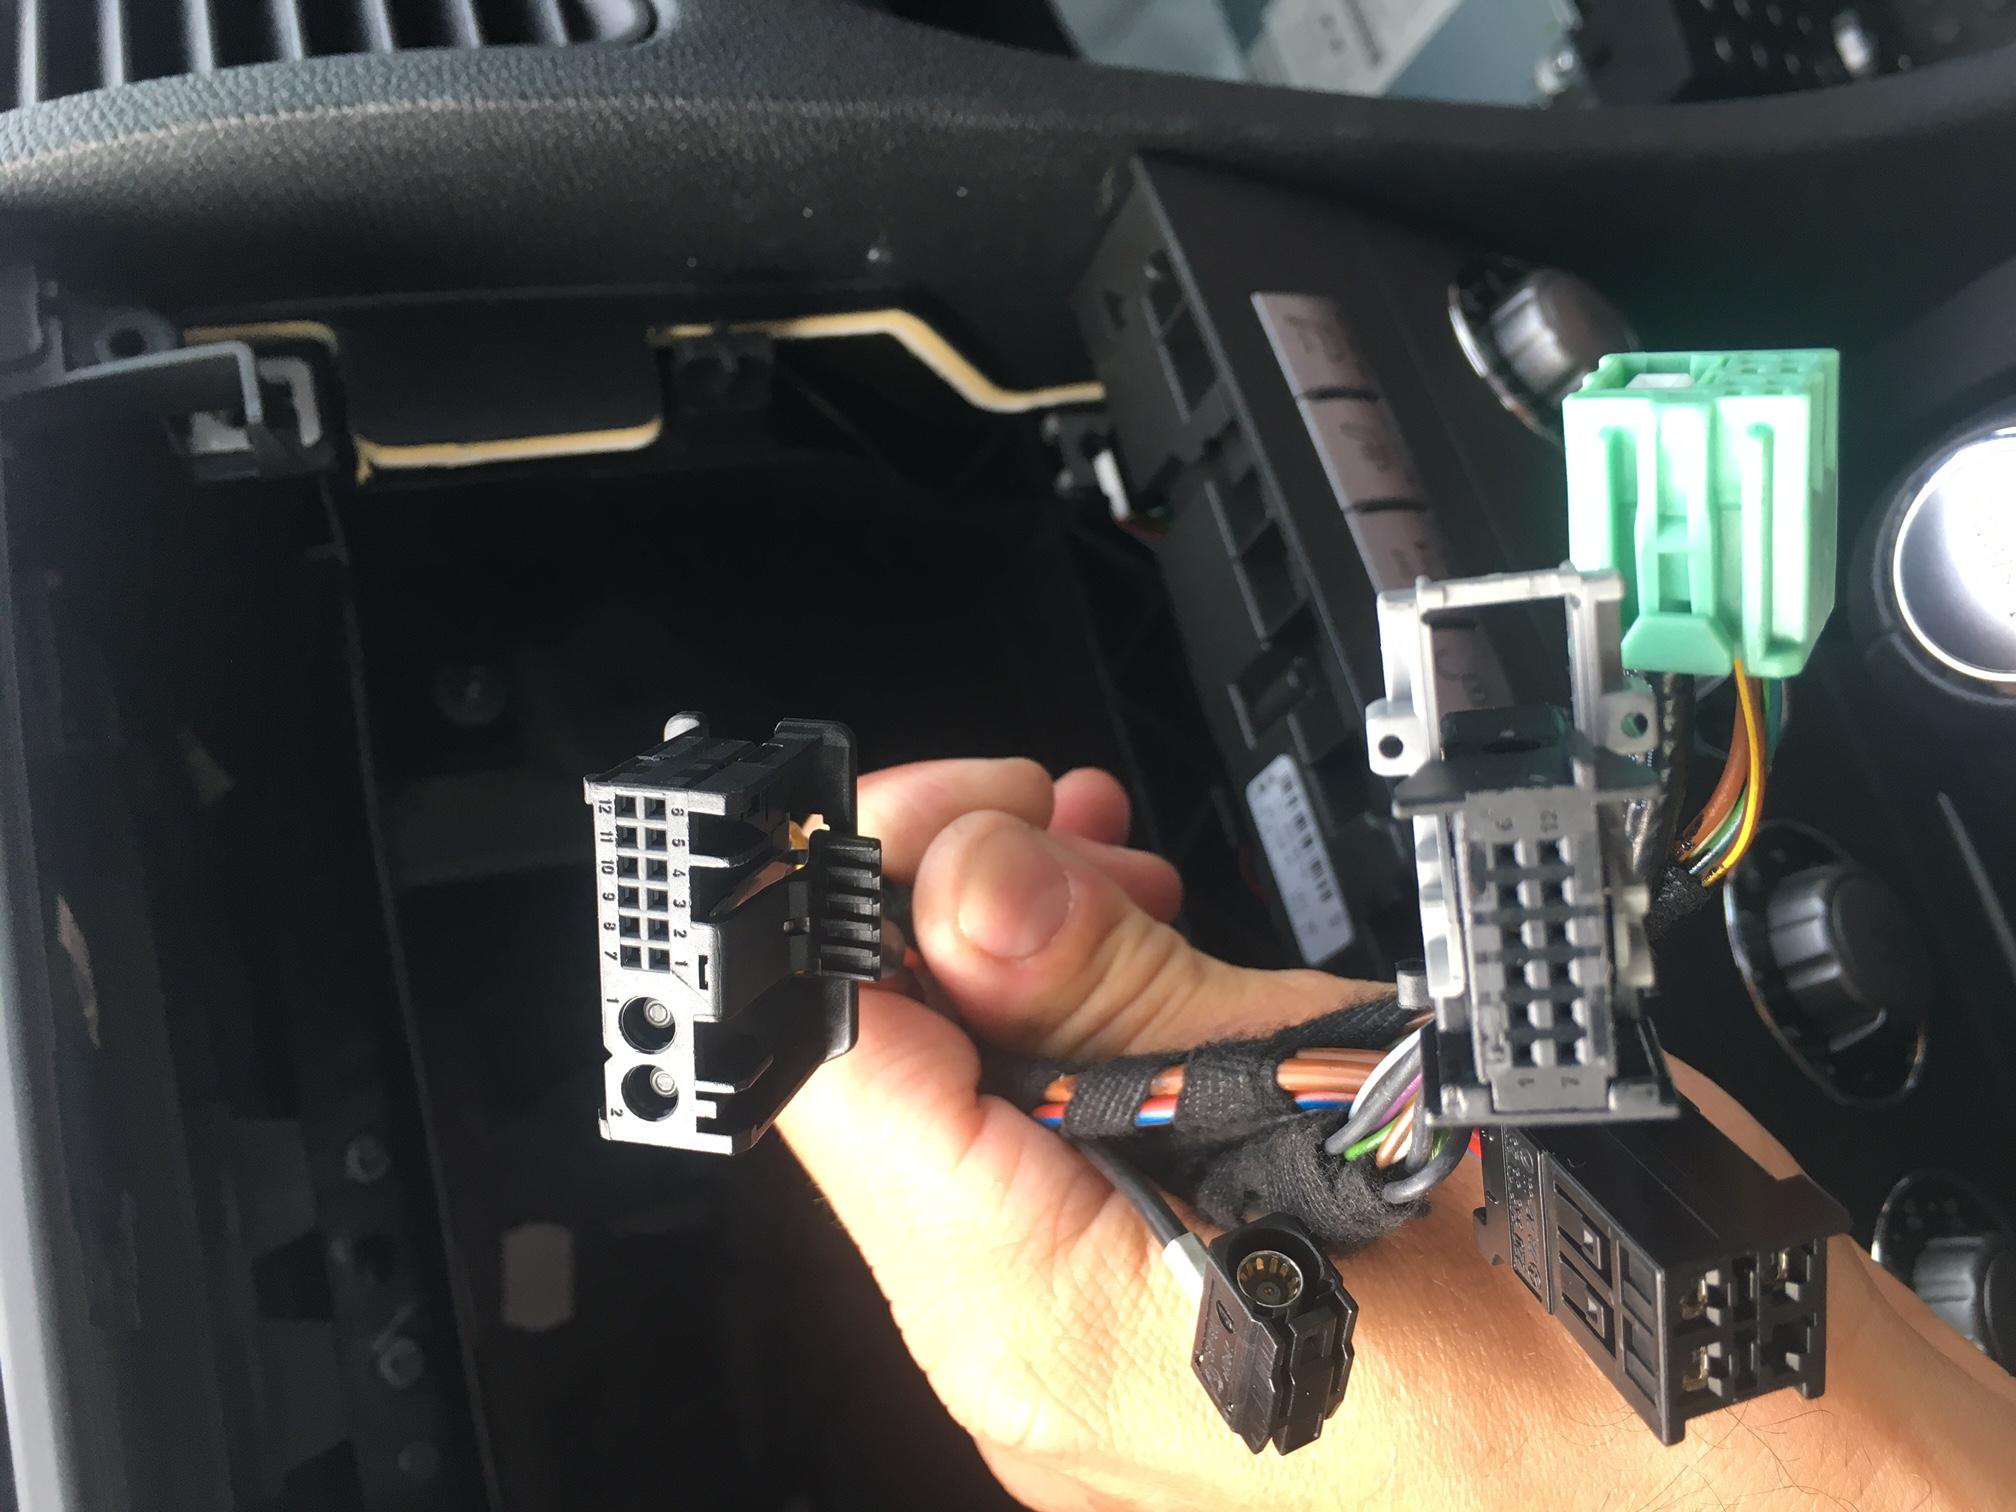 Changement d'autoradio - SLK 55 AMG import Japon 745122IMG9854